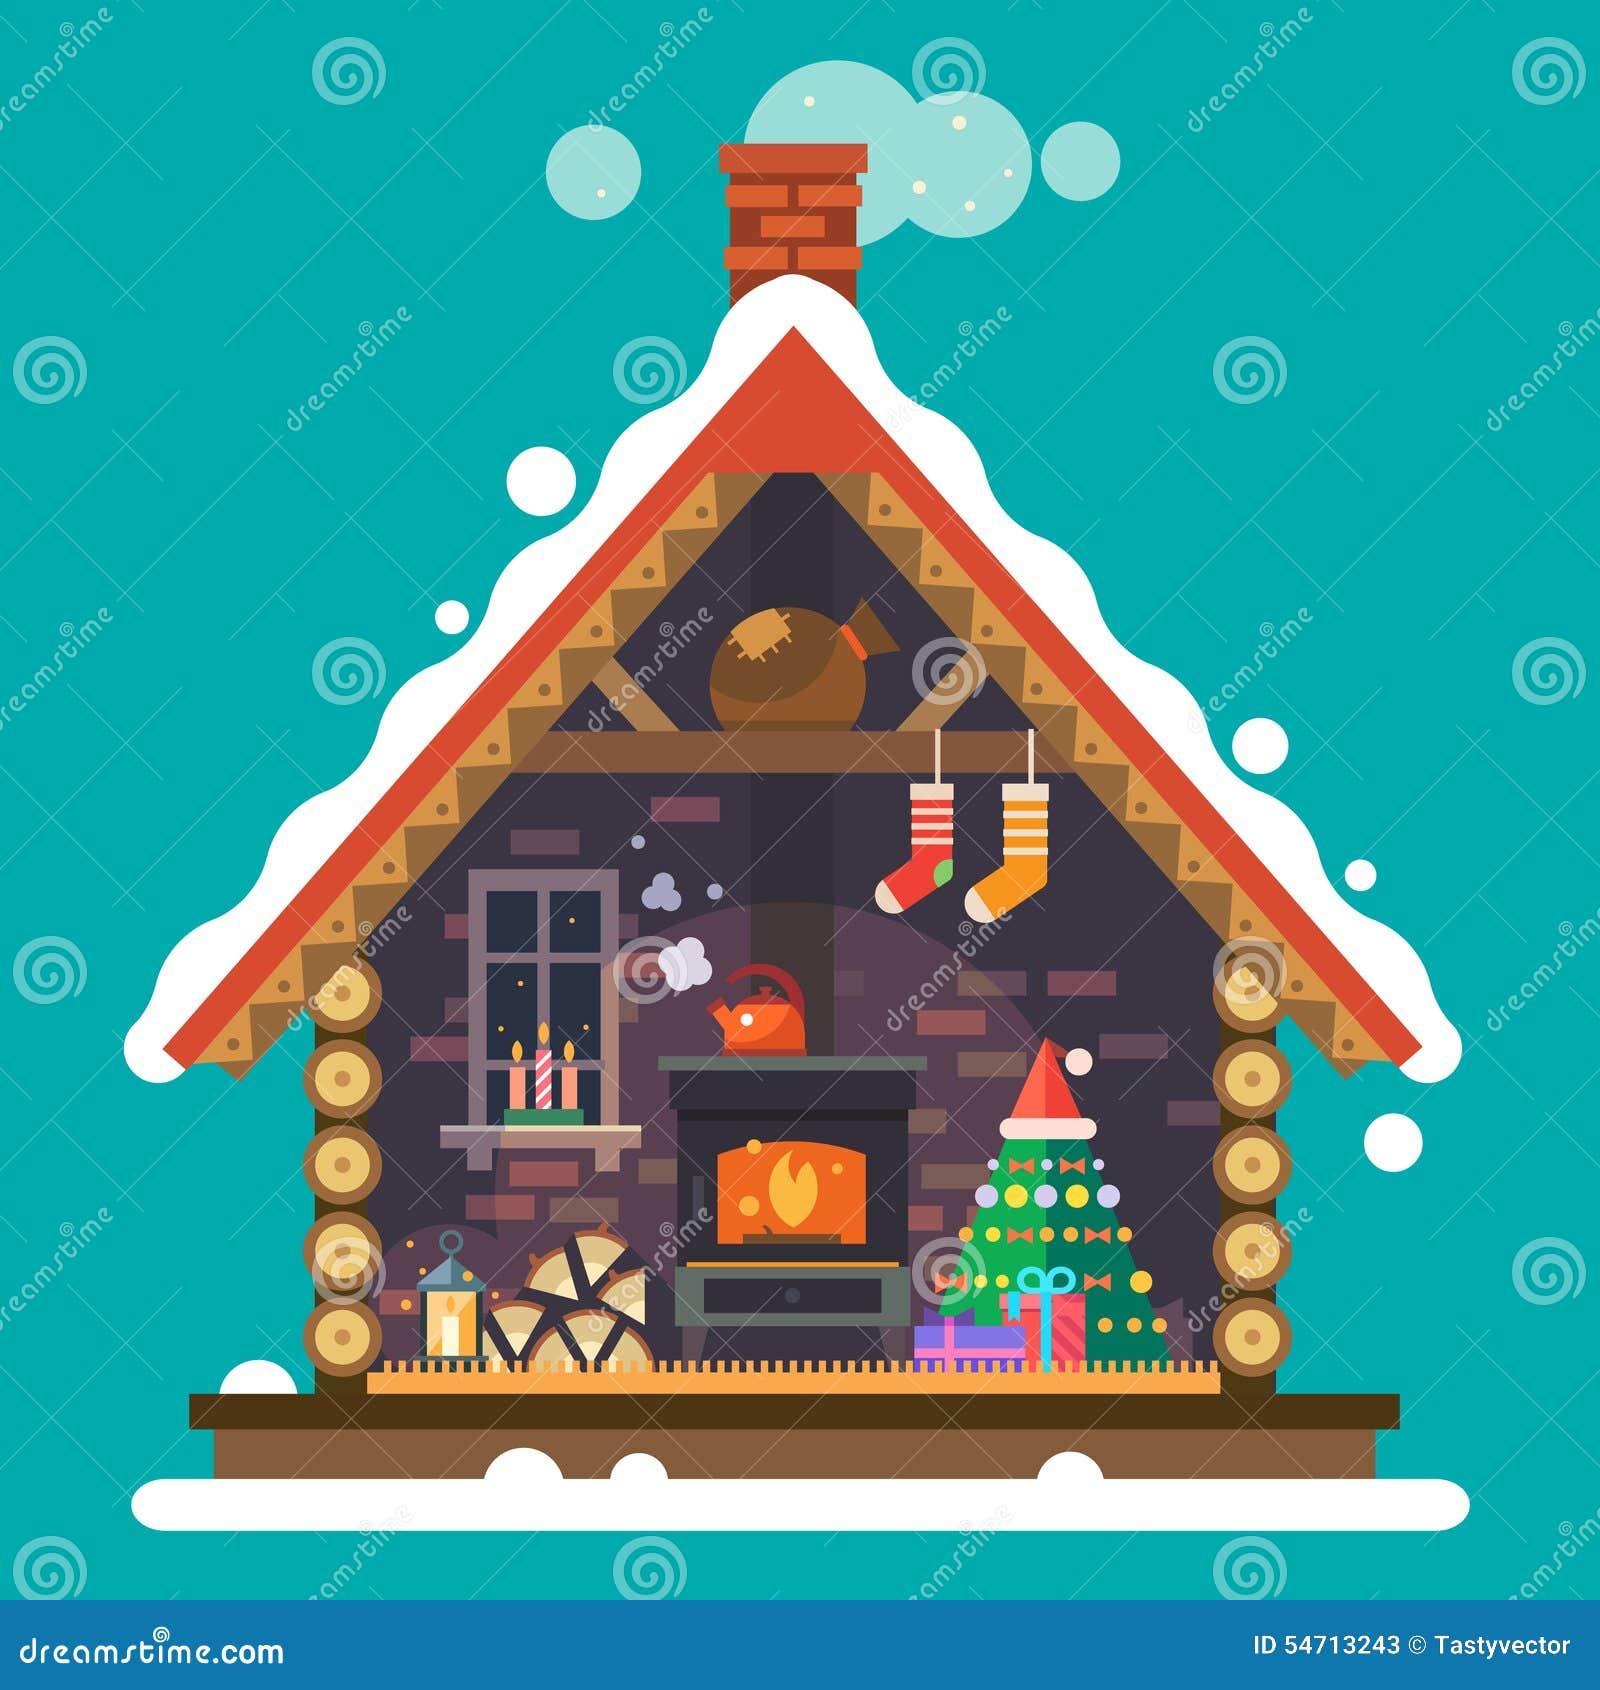 House Of Santa Claus Stock Vector - Image: 54713243